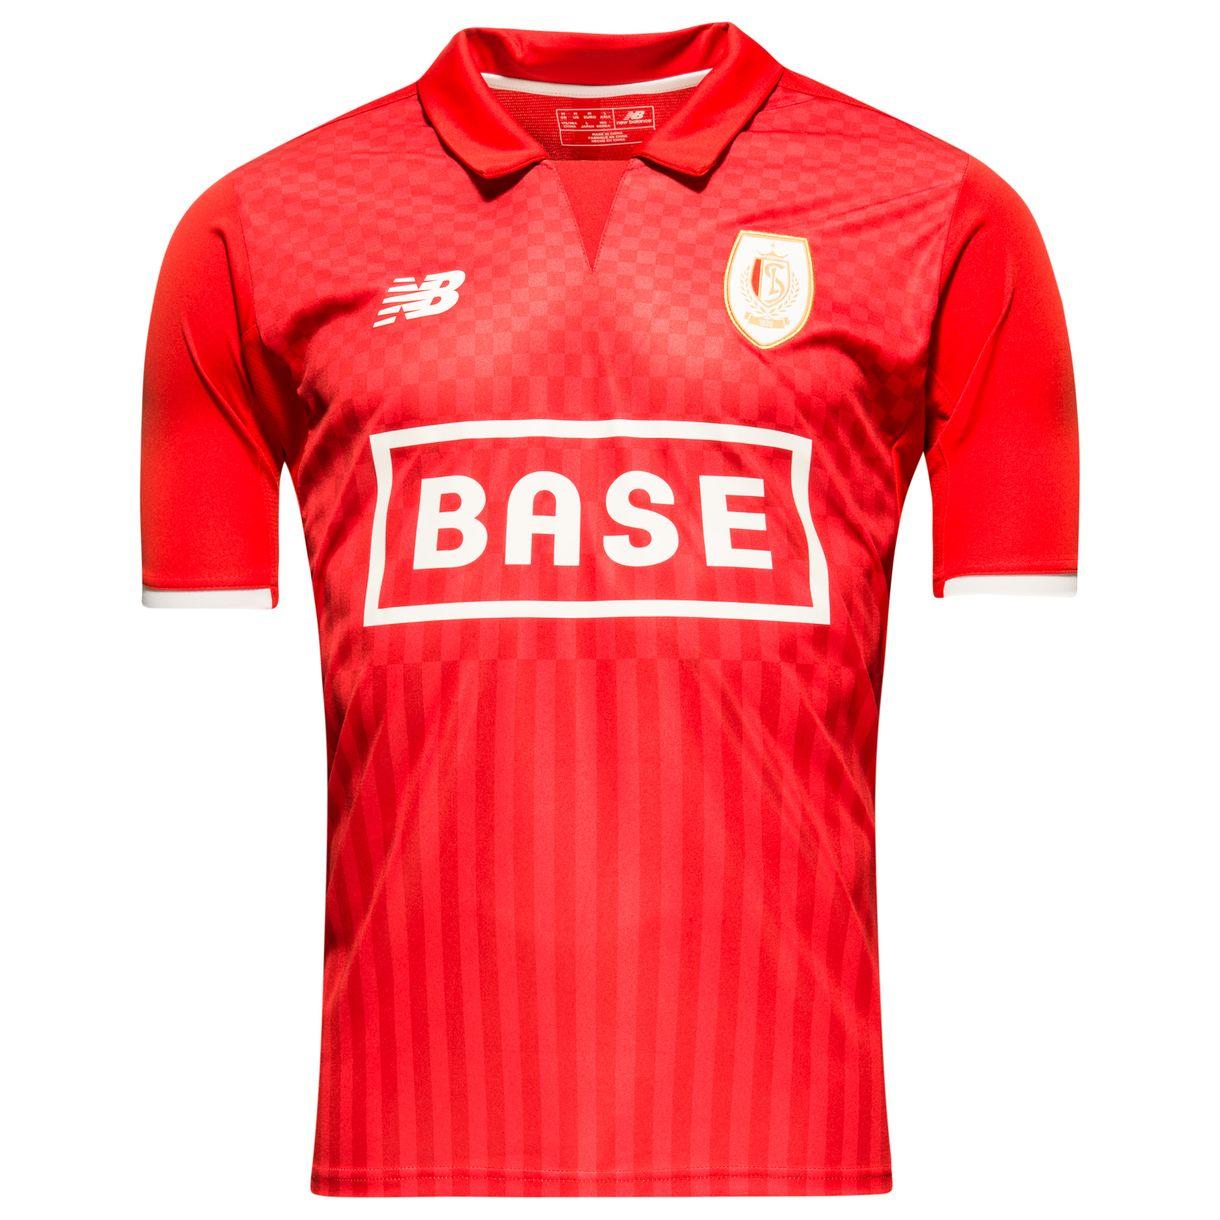 ... Standard Liège 17 18 New Balance Away Kit · Click to enlarge image  standard liege 17 18 new balance home kit a.jpg · Click to enlarge image ... 29059546a